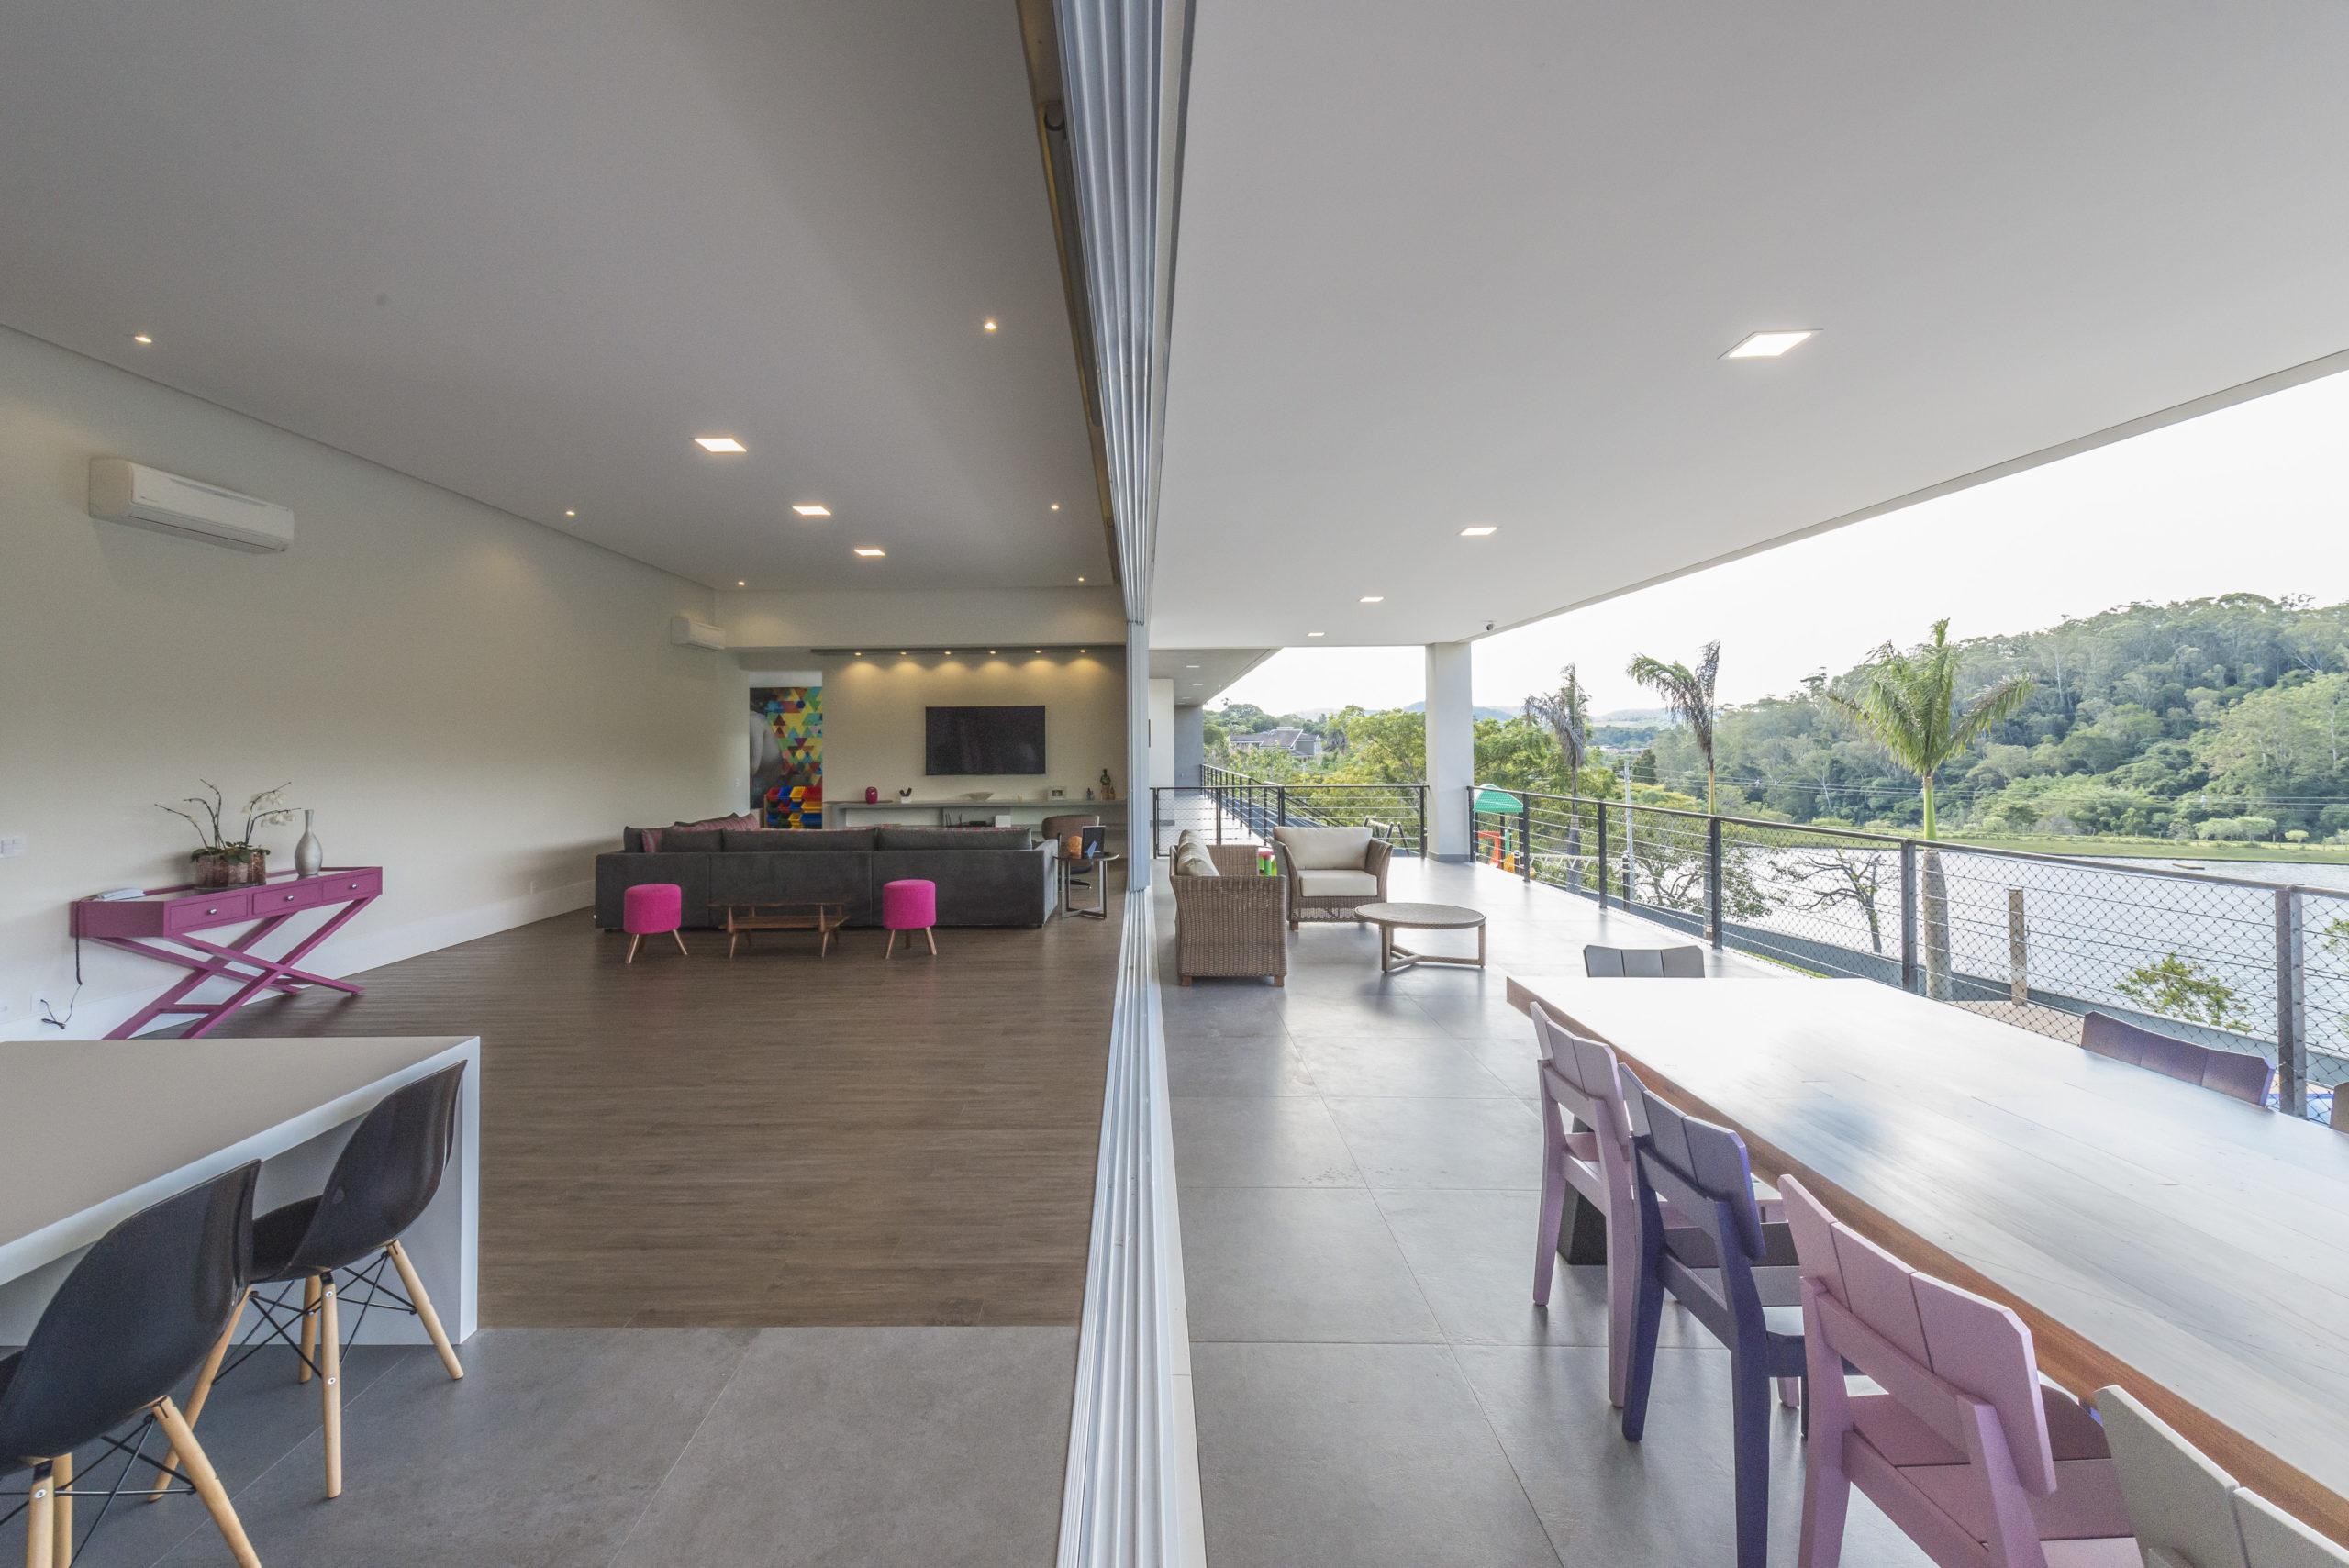 Casa L5QF - Gabriel Bampa Arquitetura